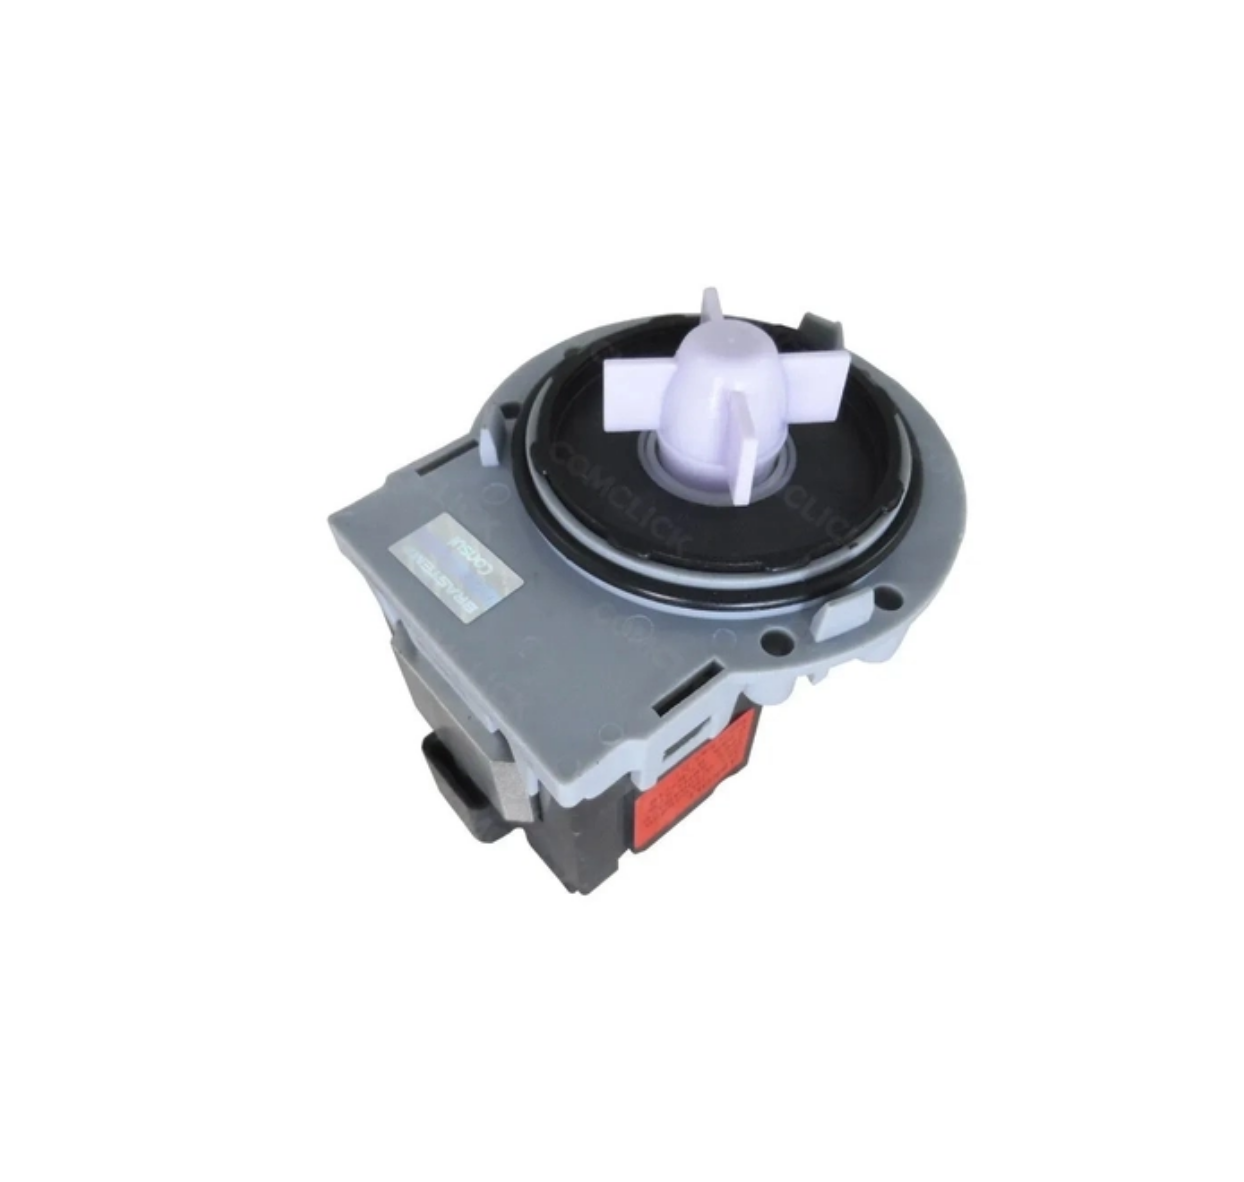 Eletrobomba Universal Corpo Para Lavadora Universal 220v